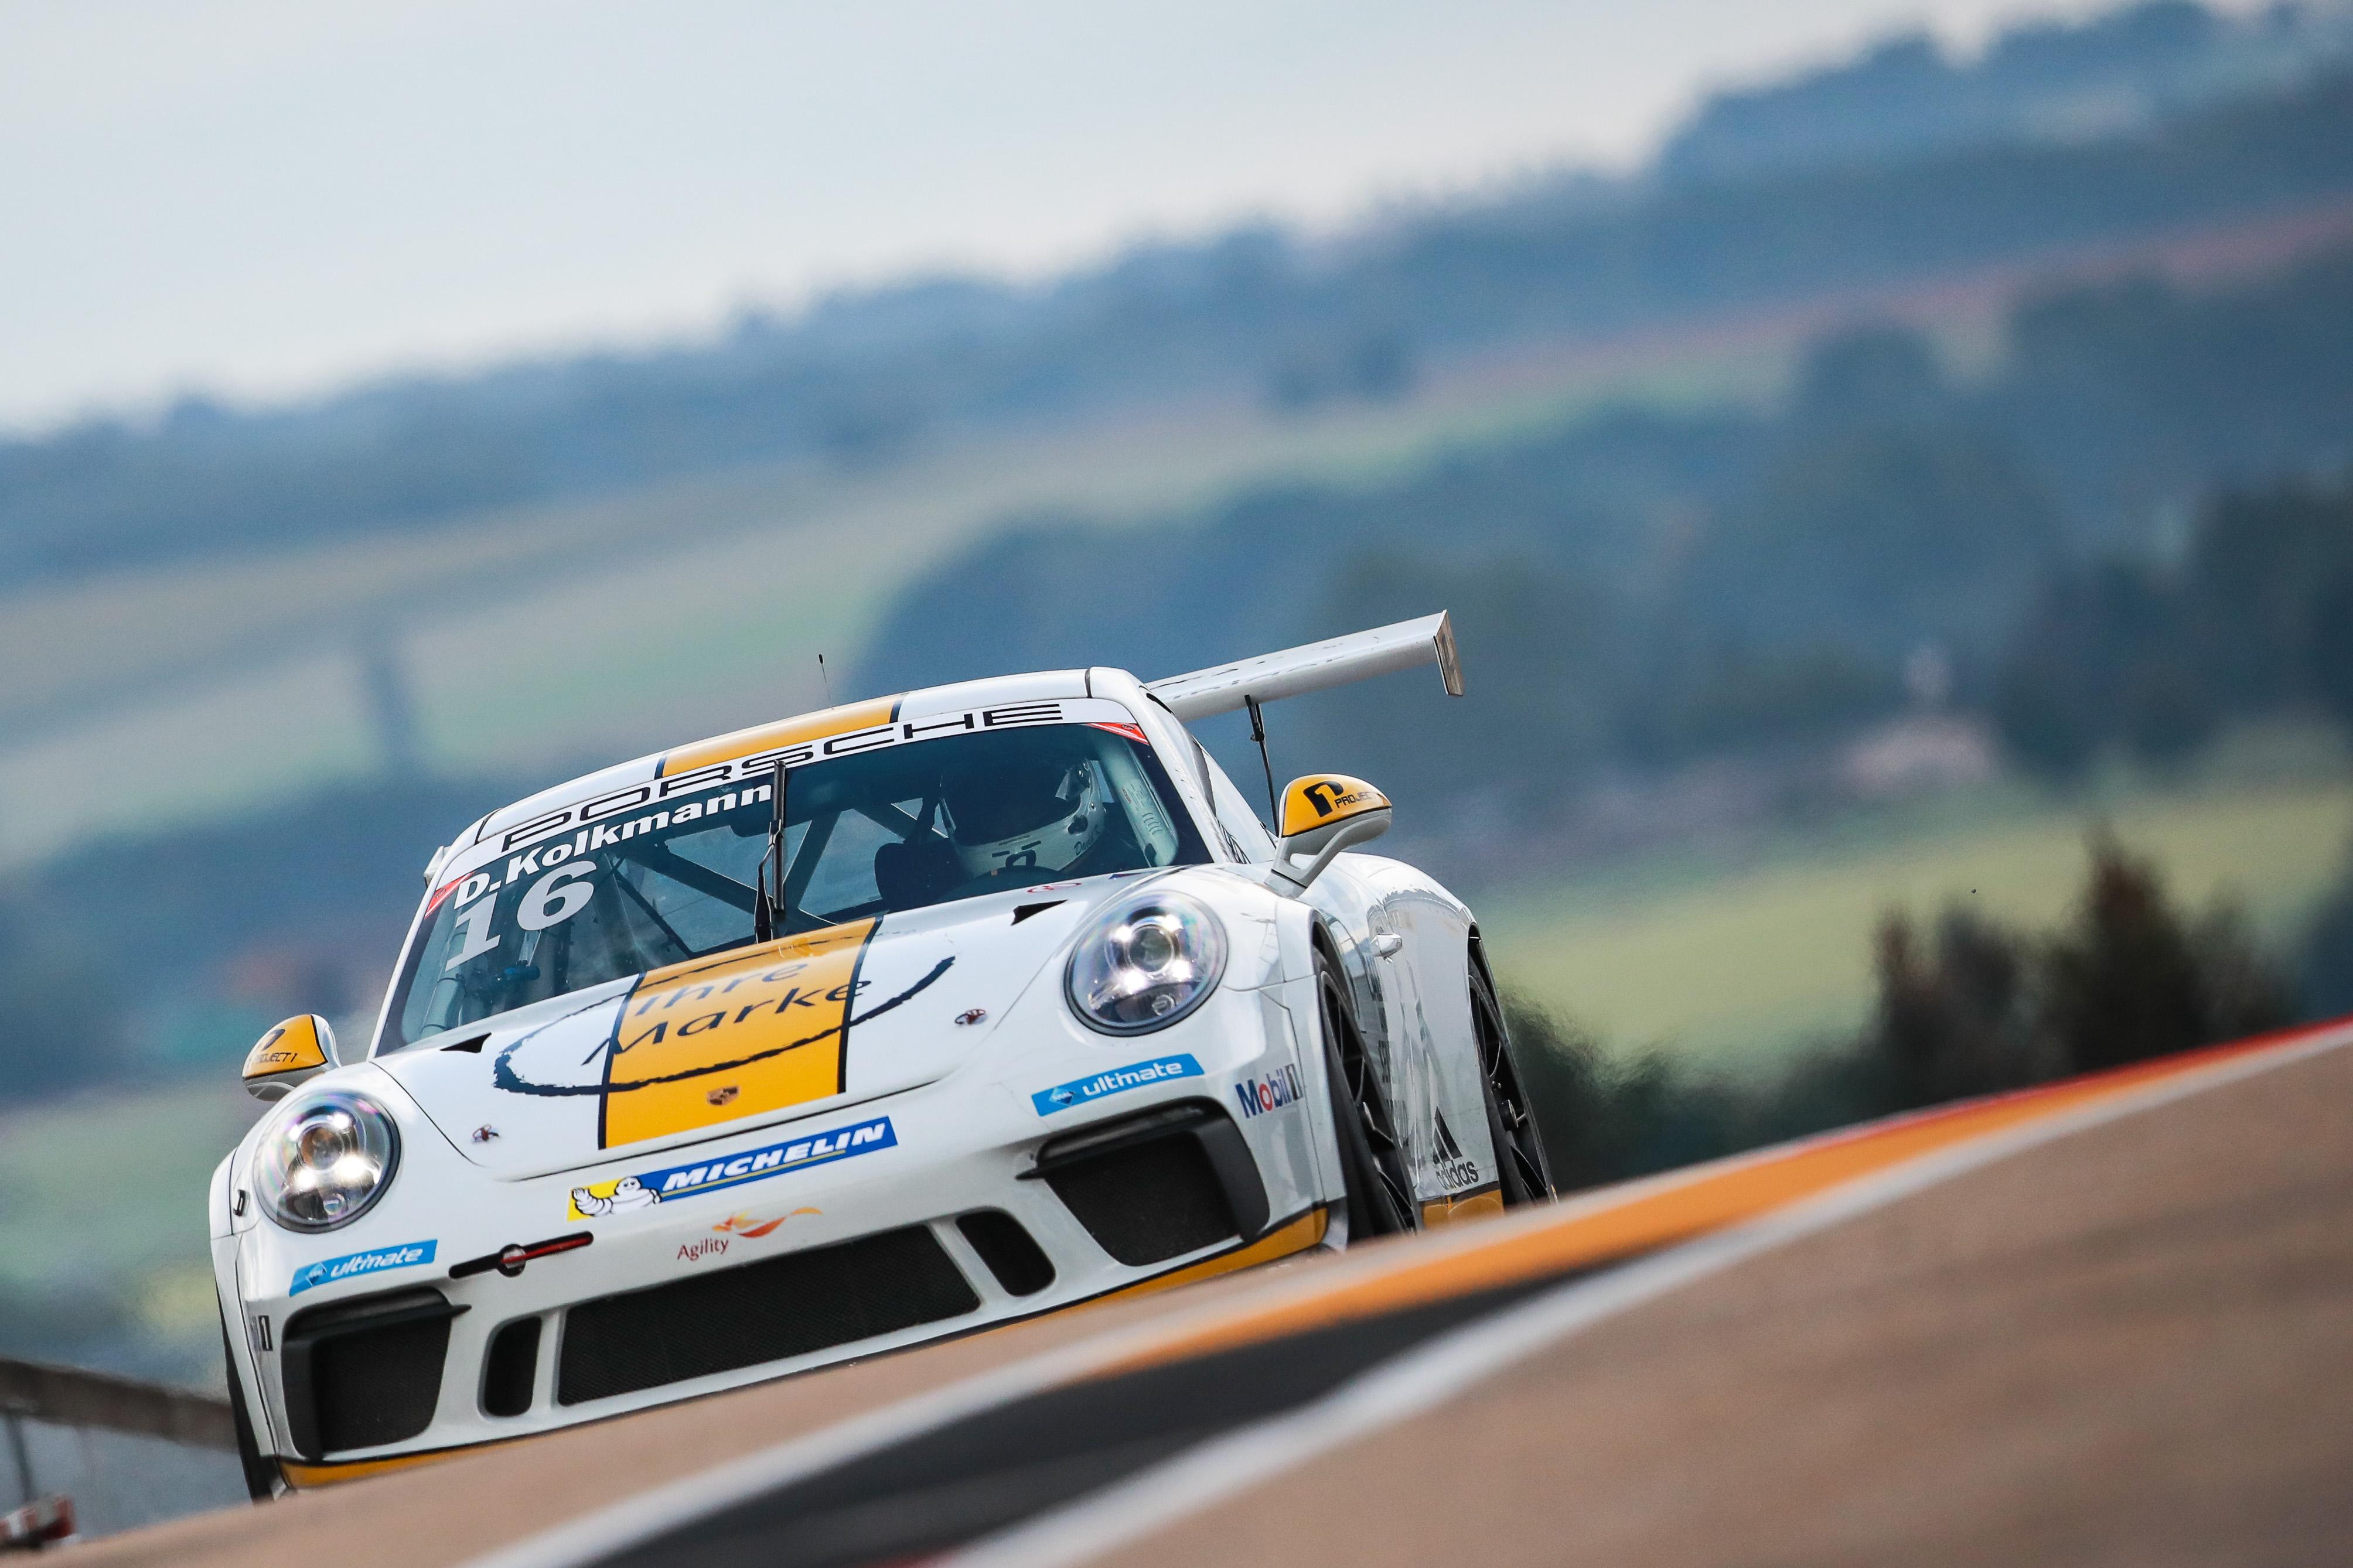 Porsche Carrera Cup, 11. + 12. Lauf 2017, Sachsenring - Foto: Gruppe C Photography